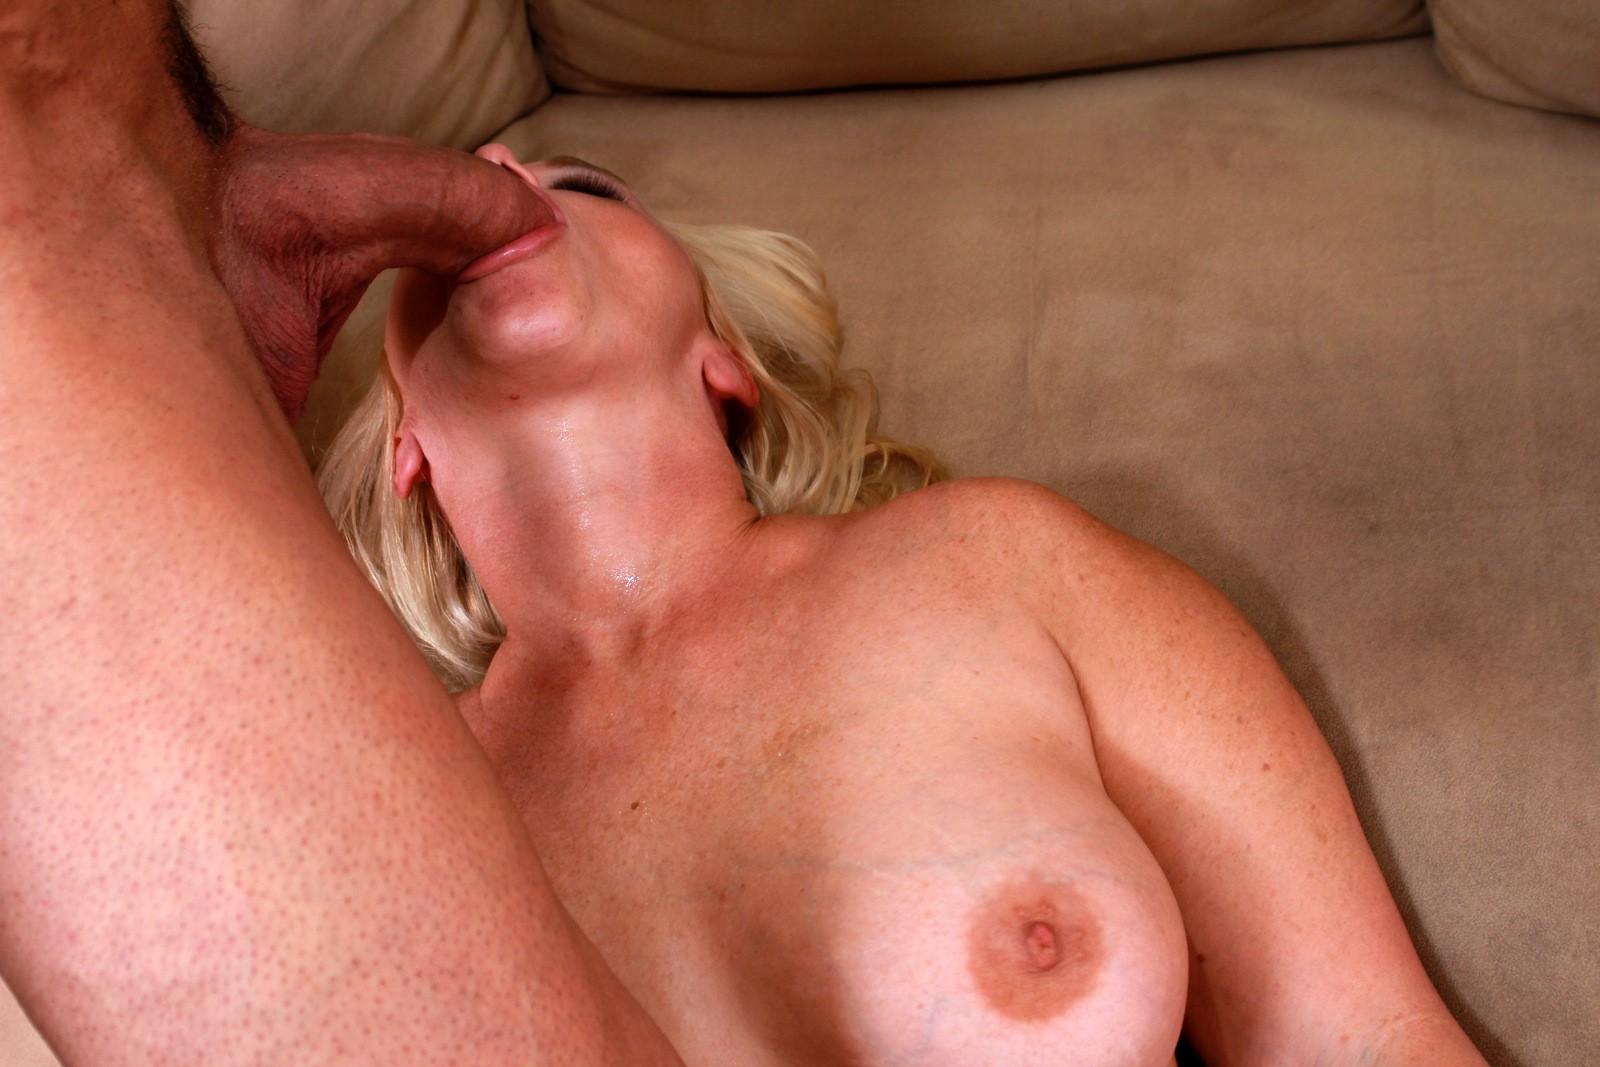 Free squirting fisting female ejaculation videos bukkake